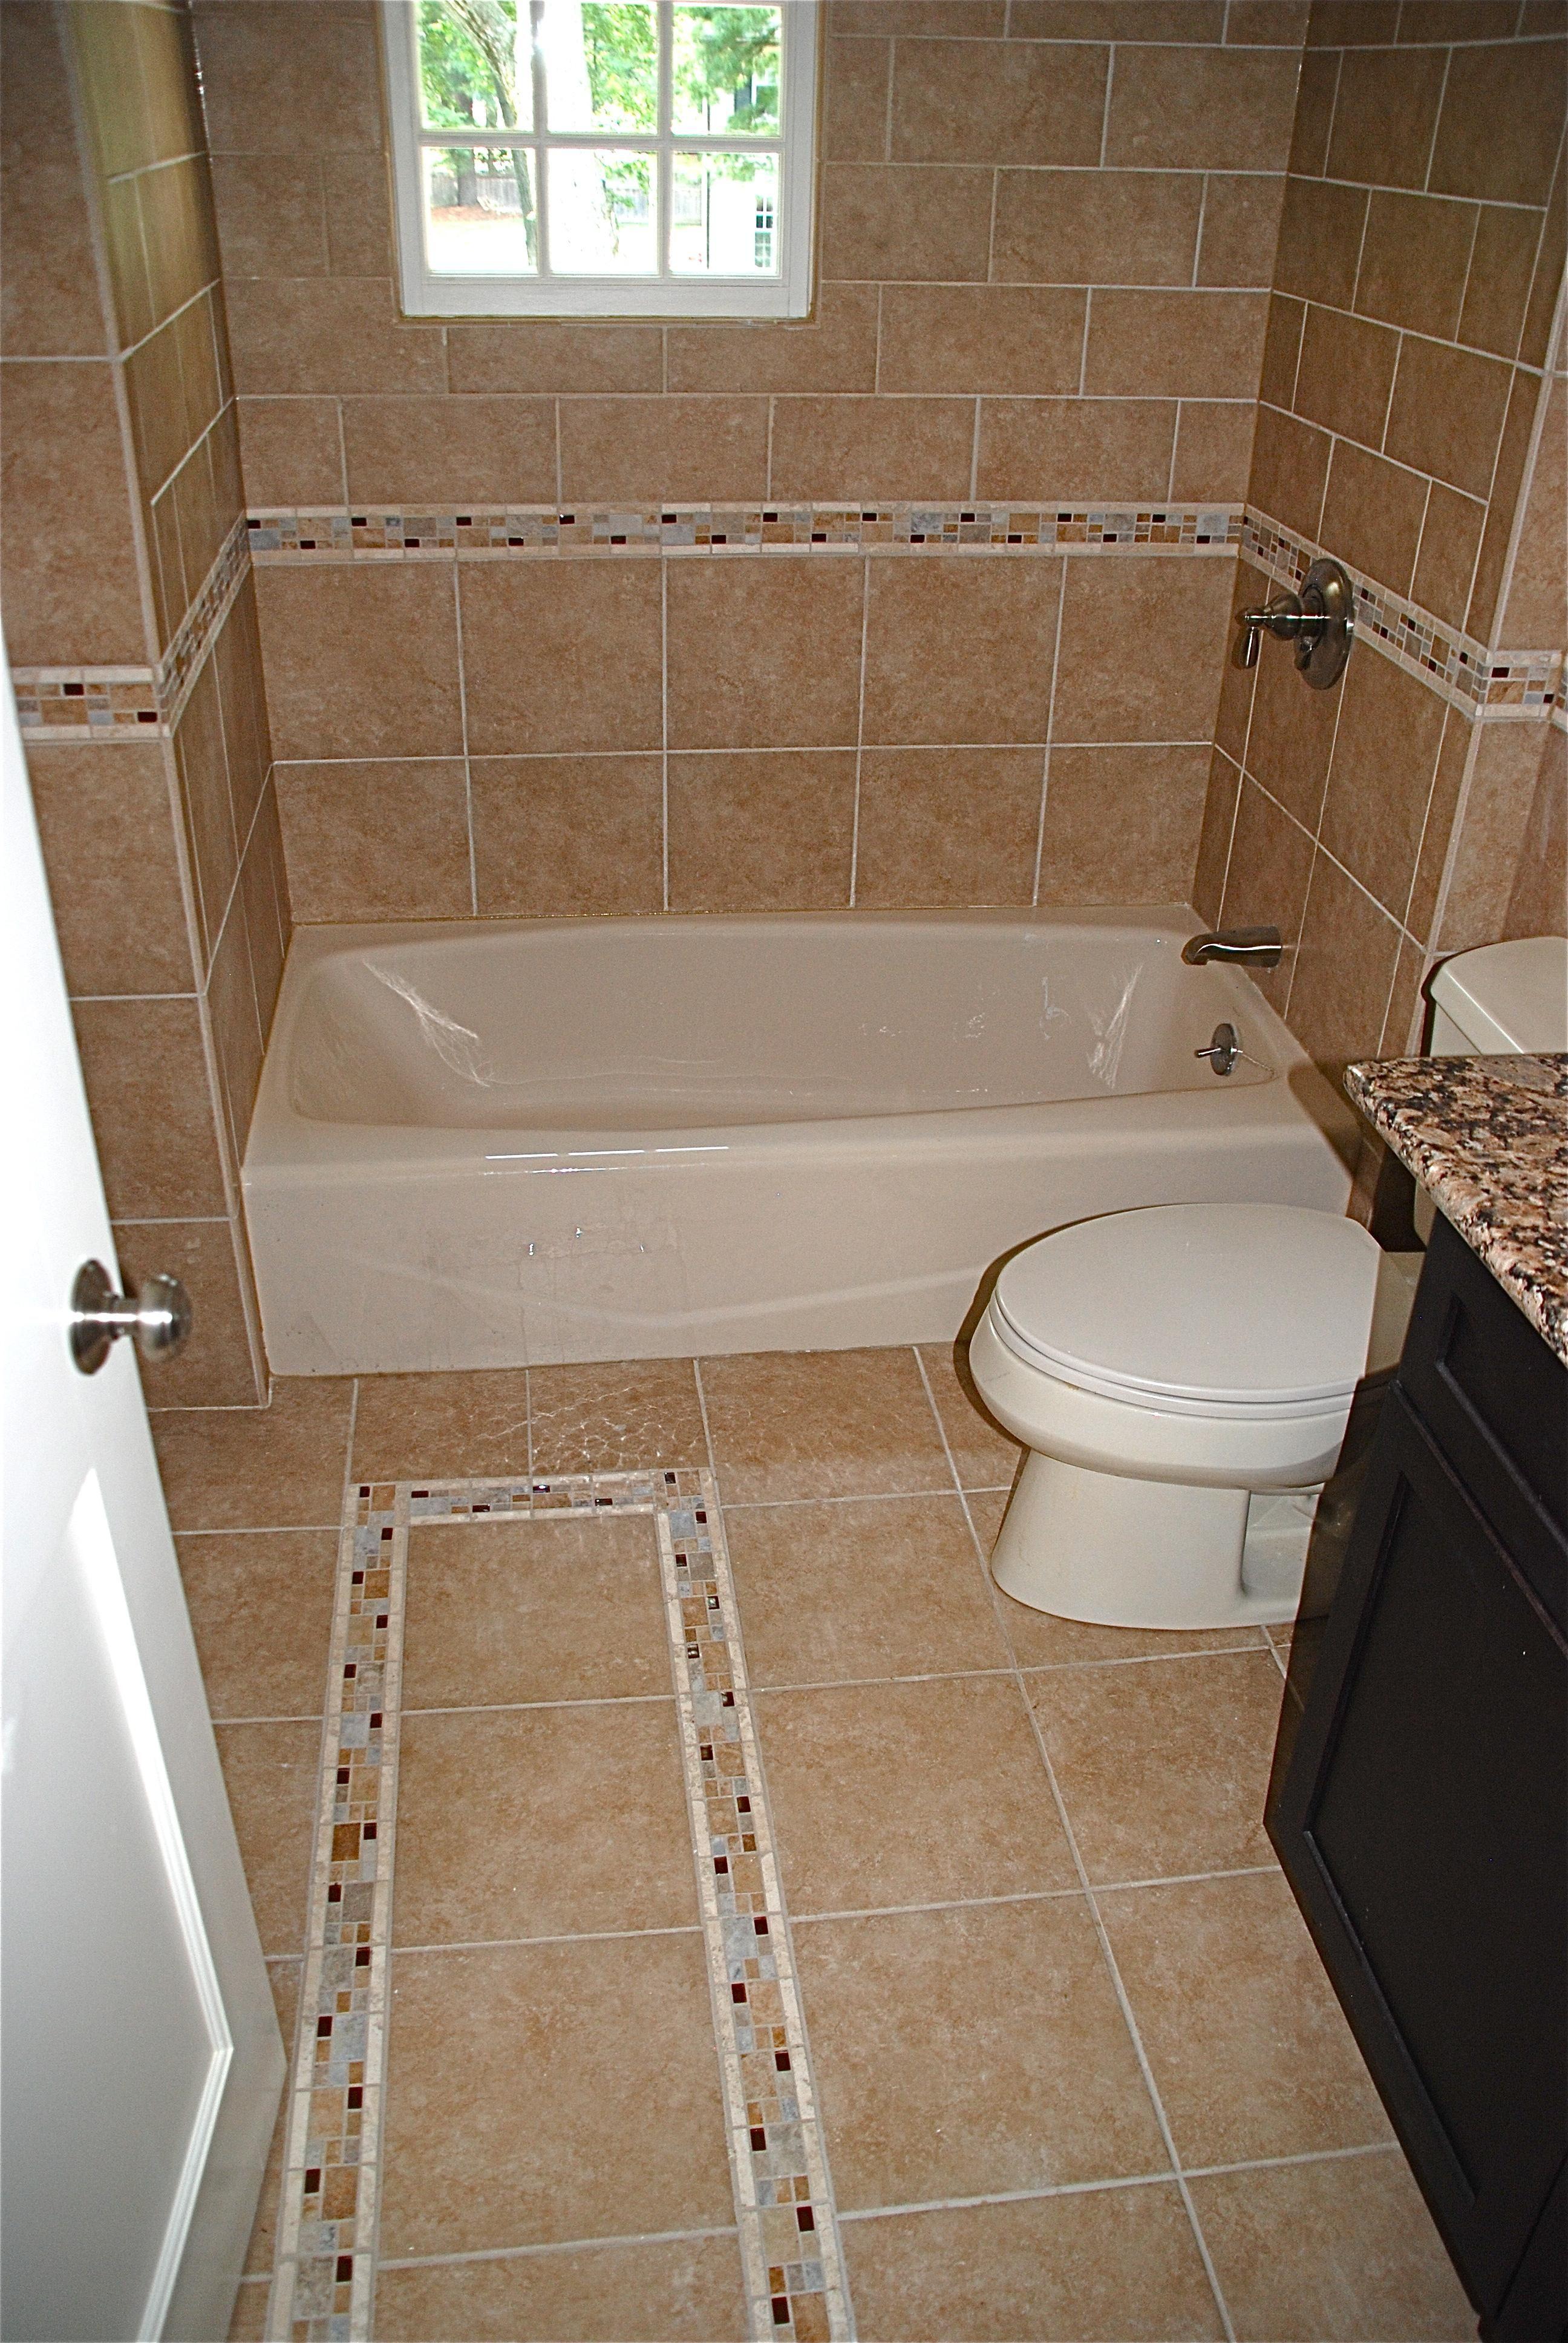 Bathroom Floor Tile Home Depot | Bathroom tile designs ...